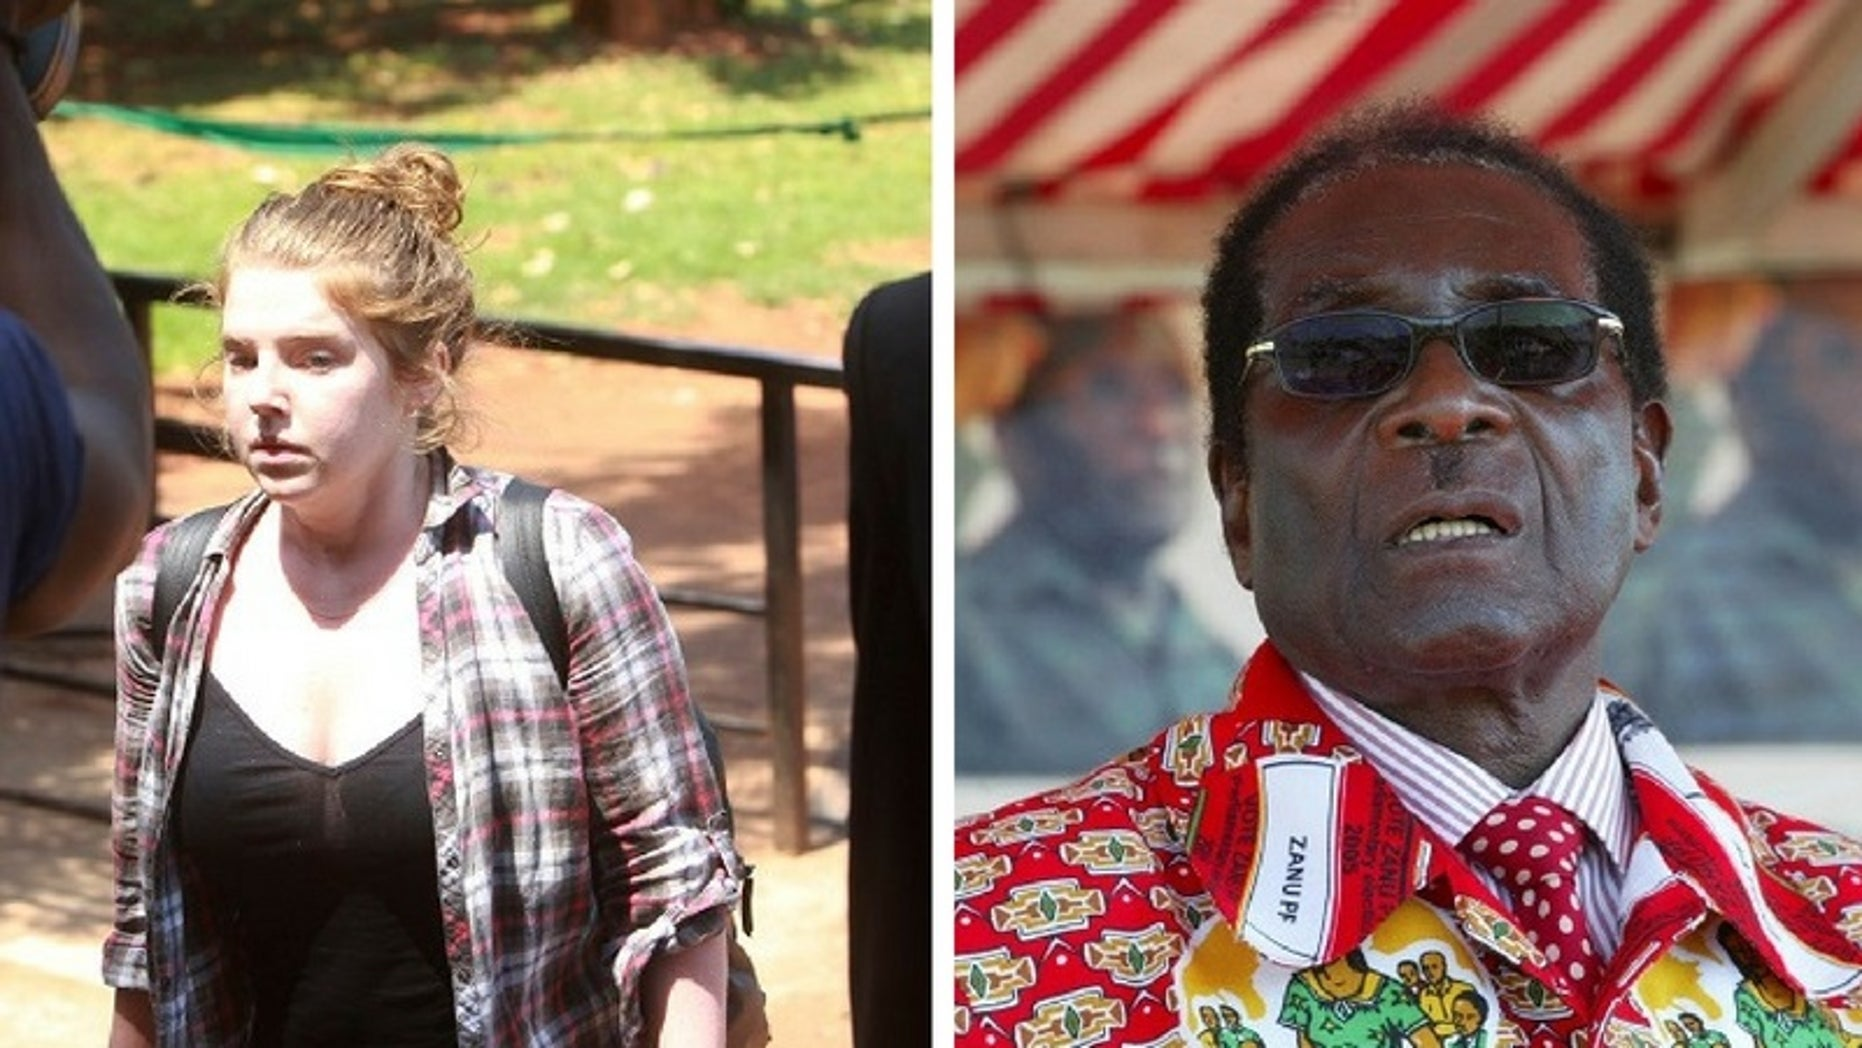 Martha O'Donovan, 25, was accused of insulting Zimbabwean President Robert Mugabe.